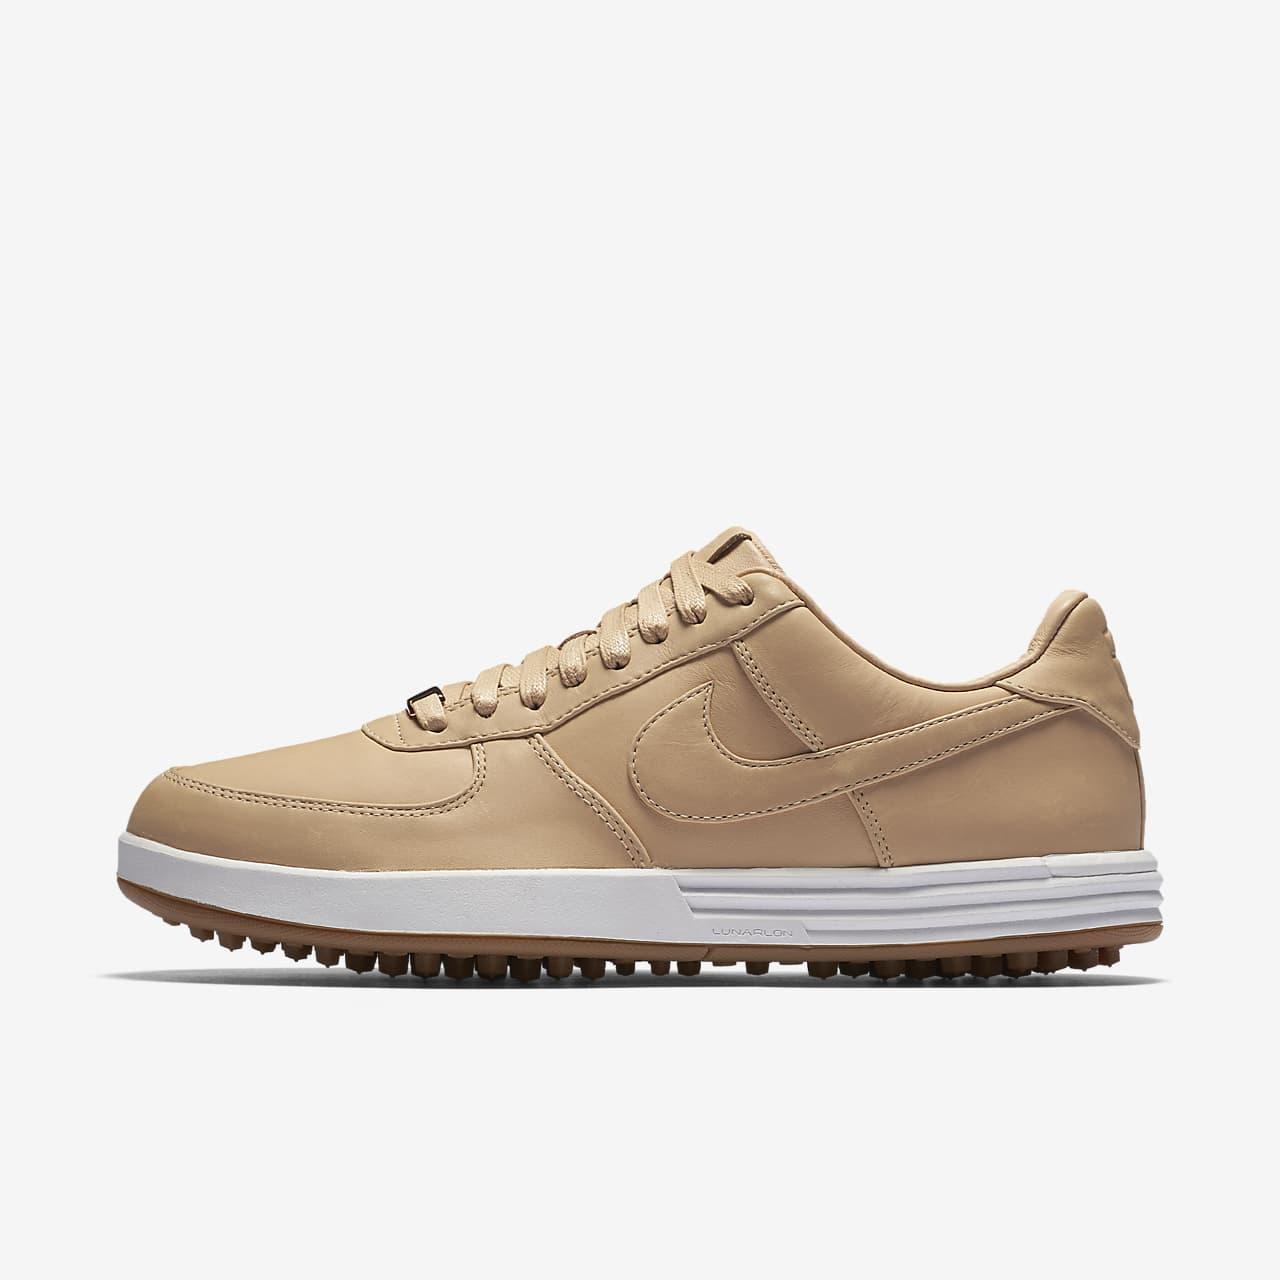 Nike Lunar Force 1 G Premium Men's Golf Shoe